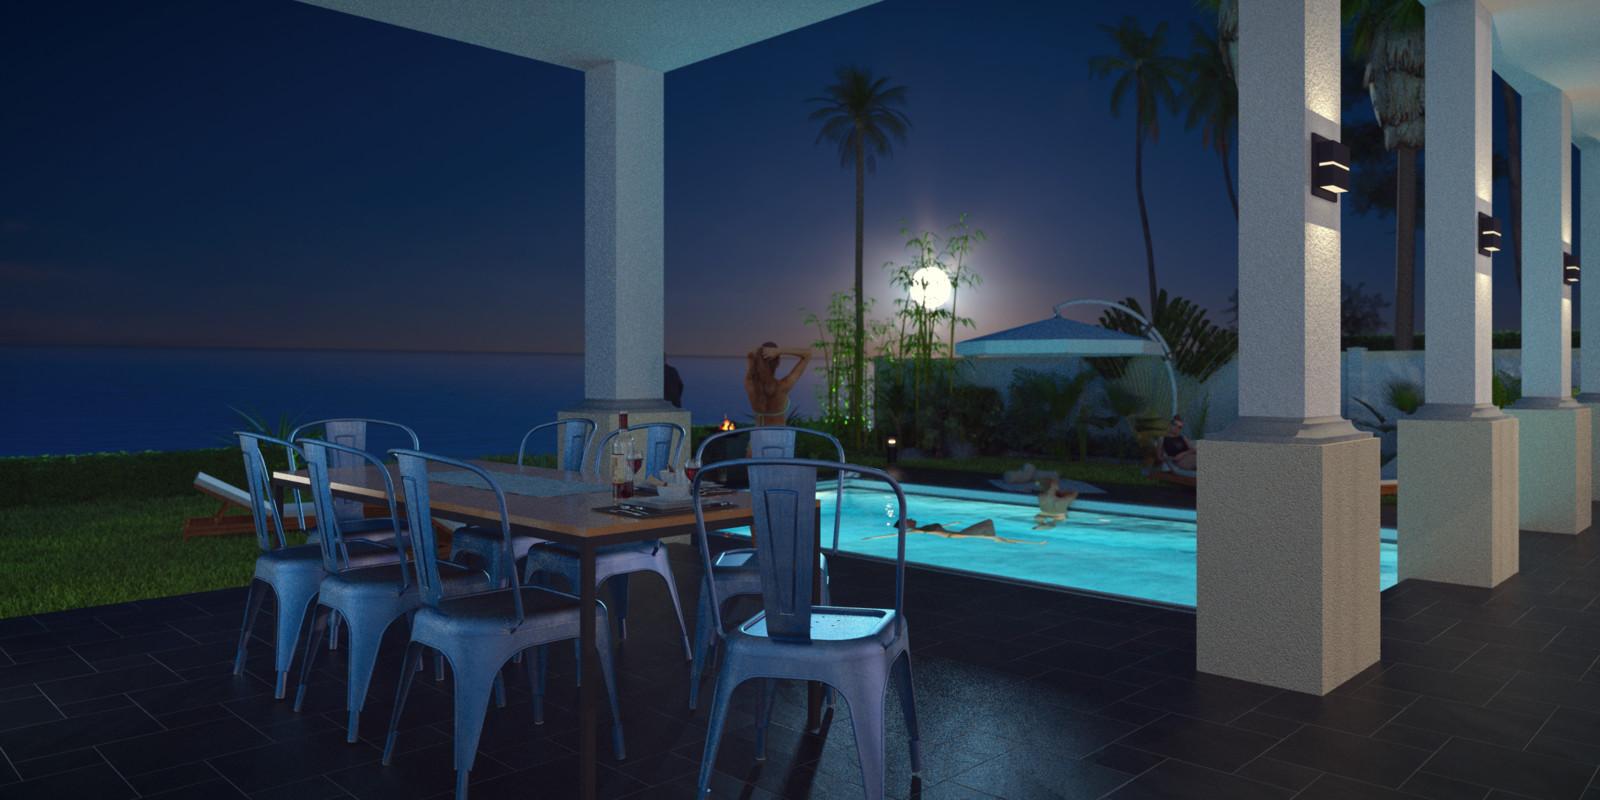 SketchUp + Thea Render  Seagrove Beach House: Ext Kit 05 Studio Night A Lumina 2160 × 1080 Presto MC Bucket